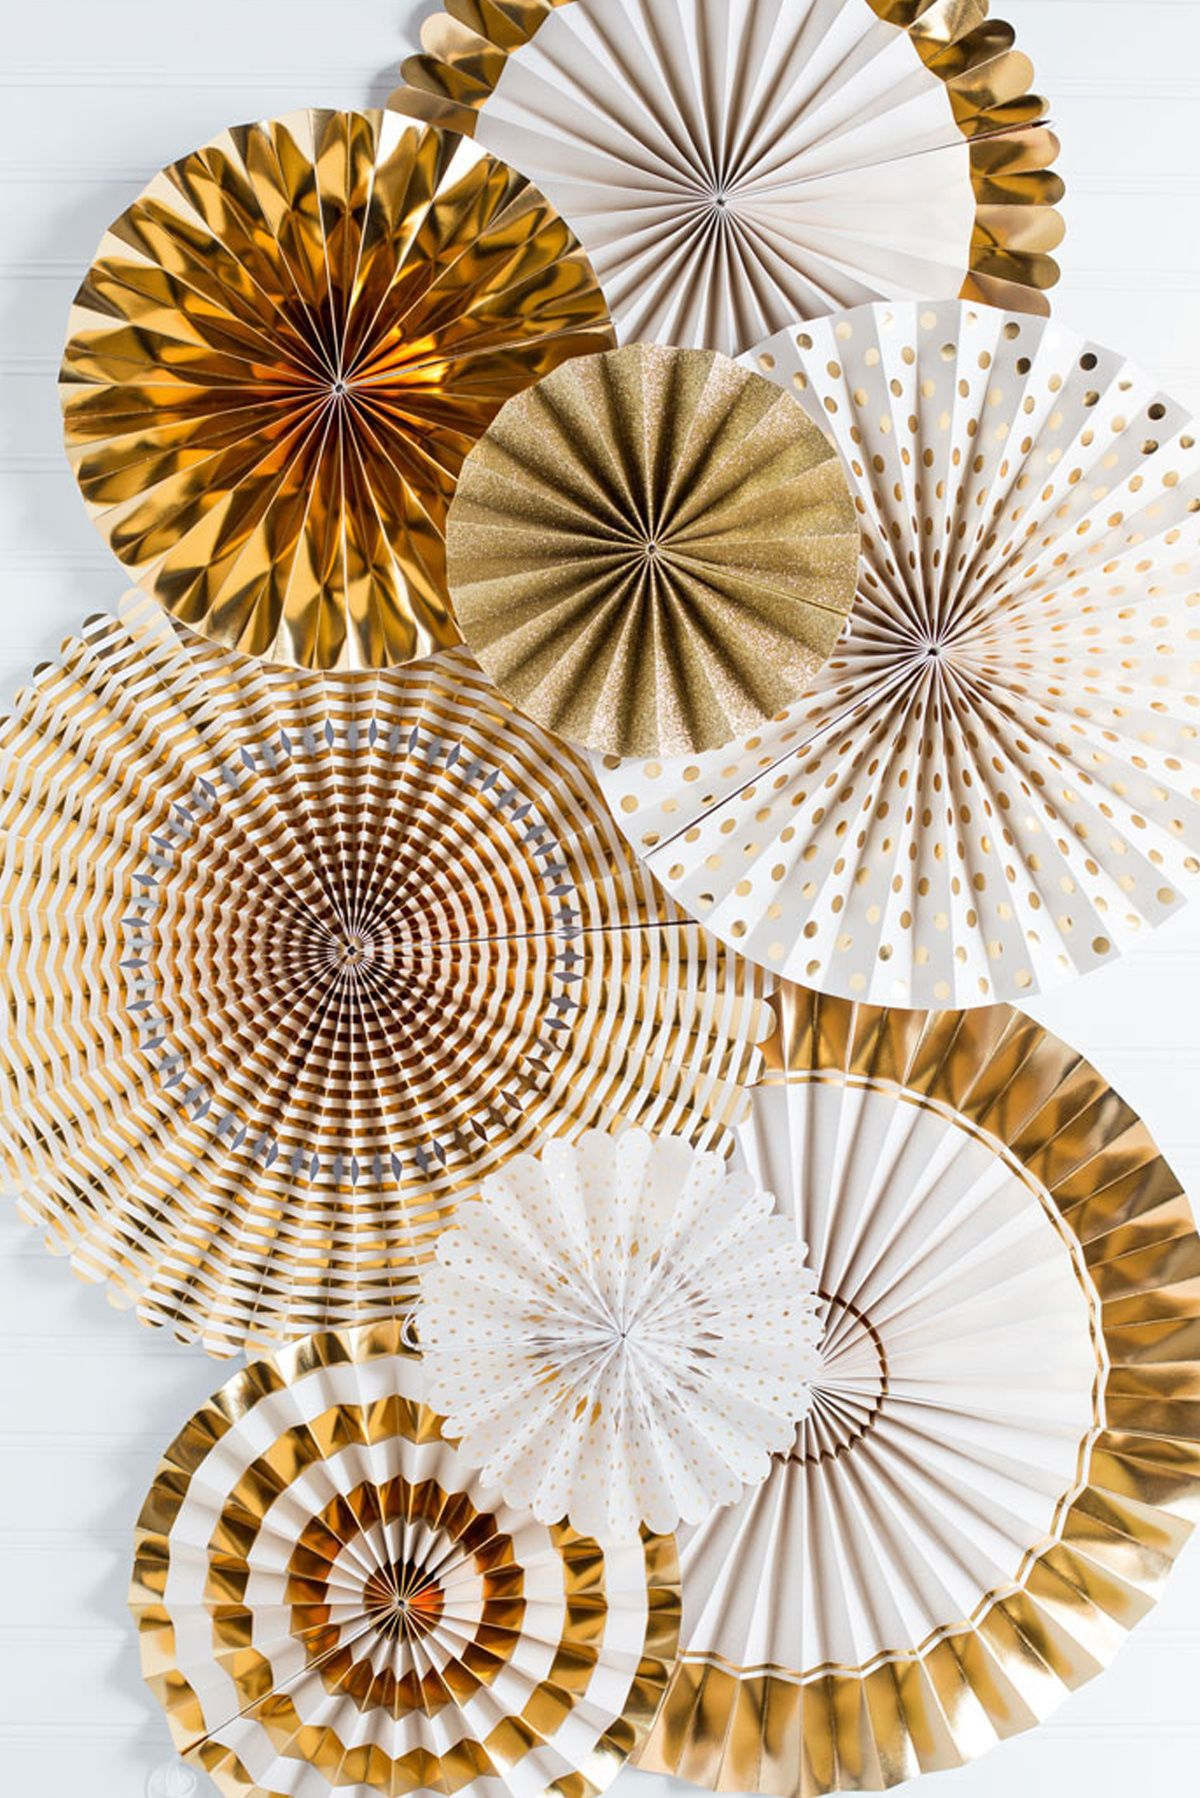 Fancy Party Fans Rosette Pinwheels Gold U0026 White, Wedding Decorations, 8  Fans, MME